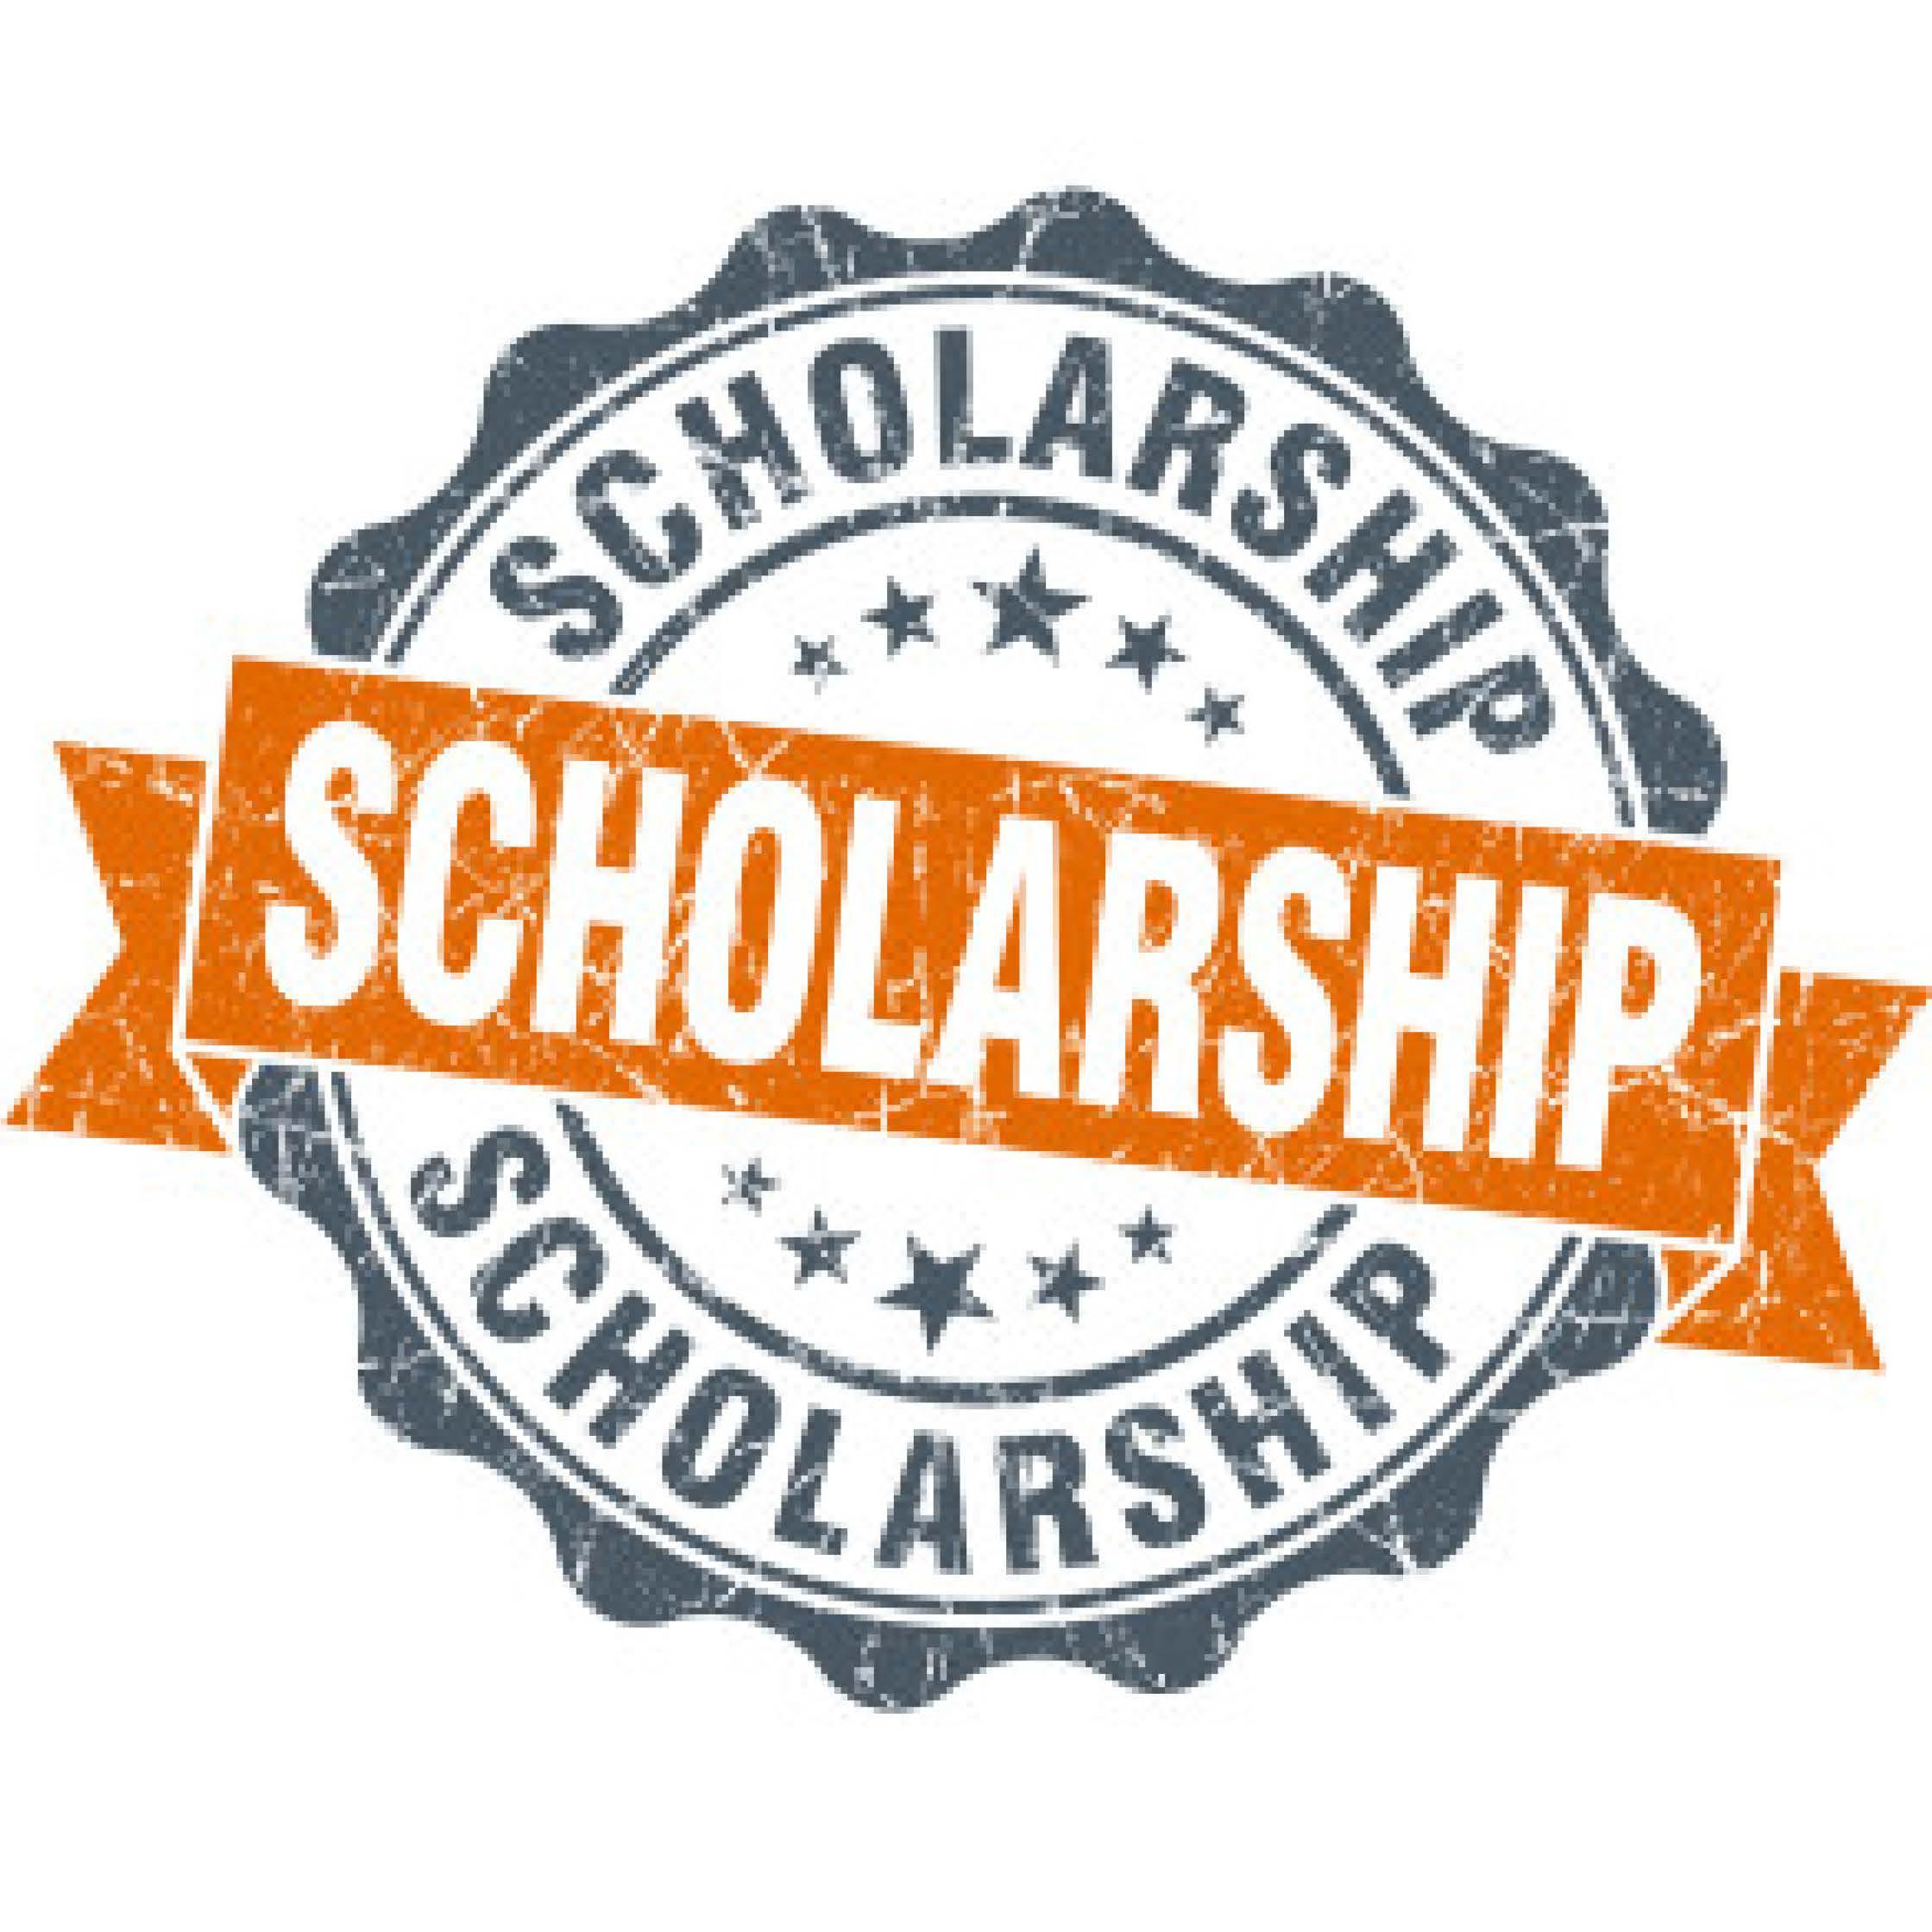 2019 Scholarships